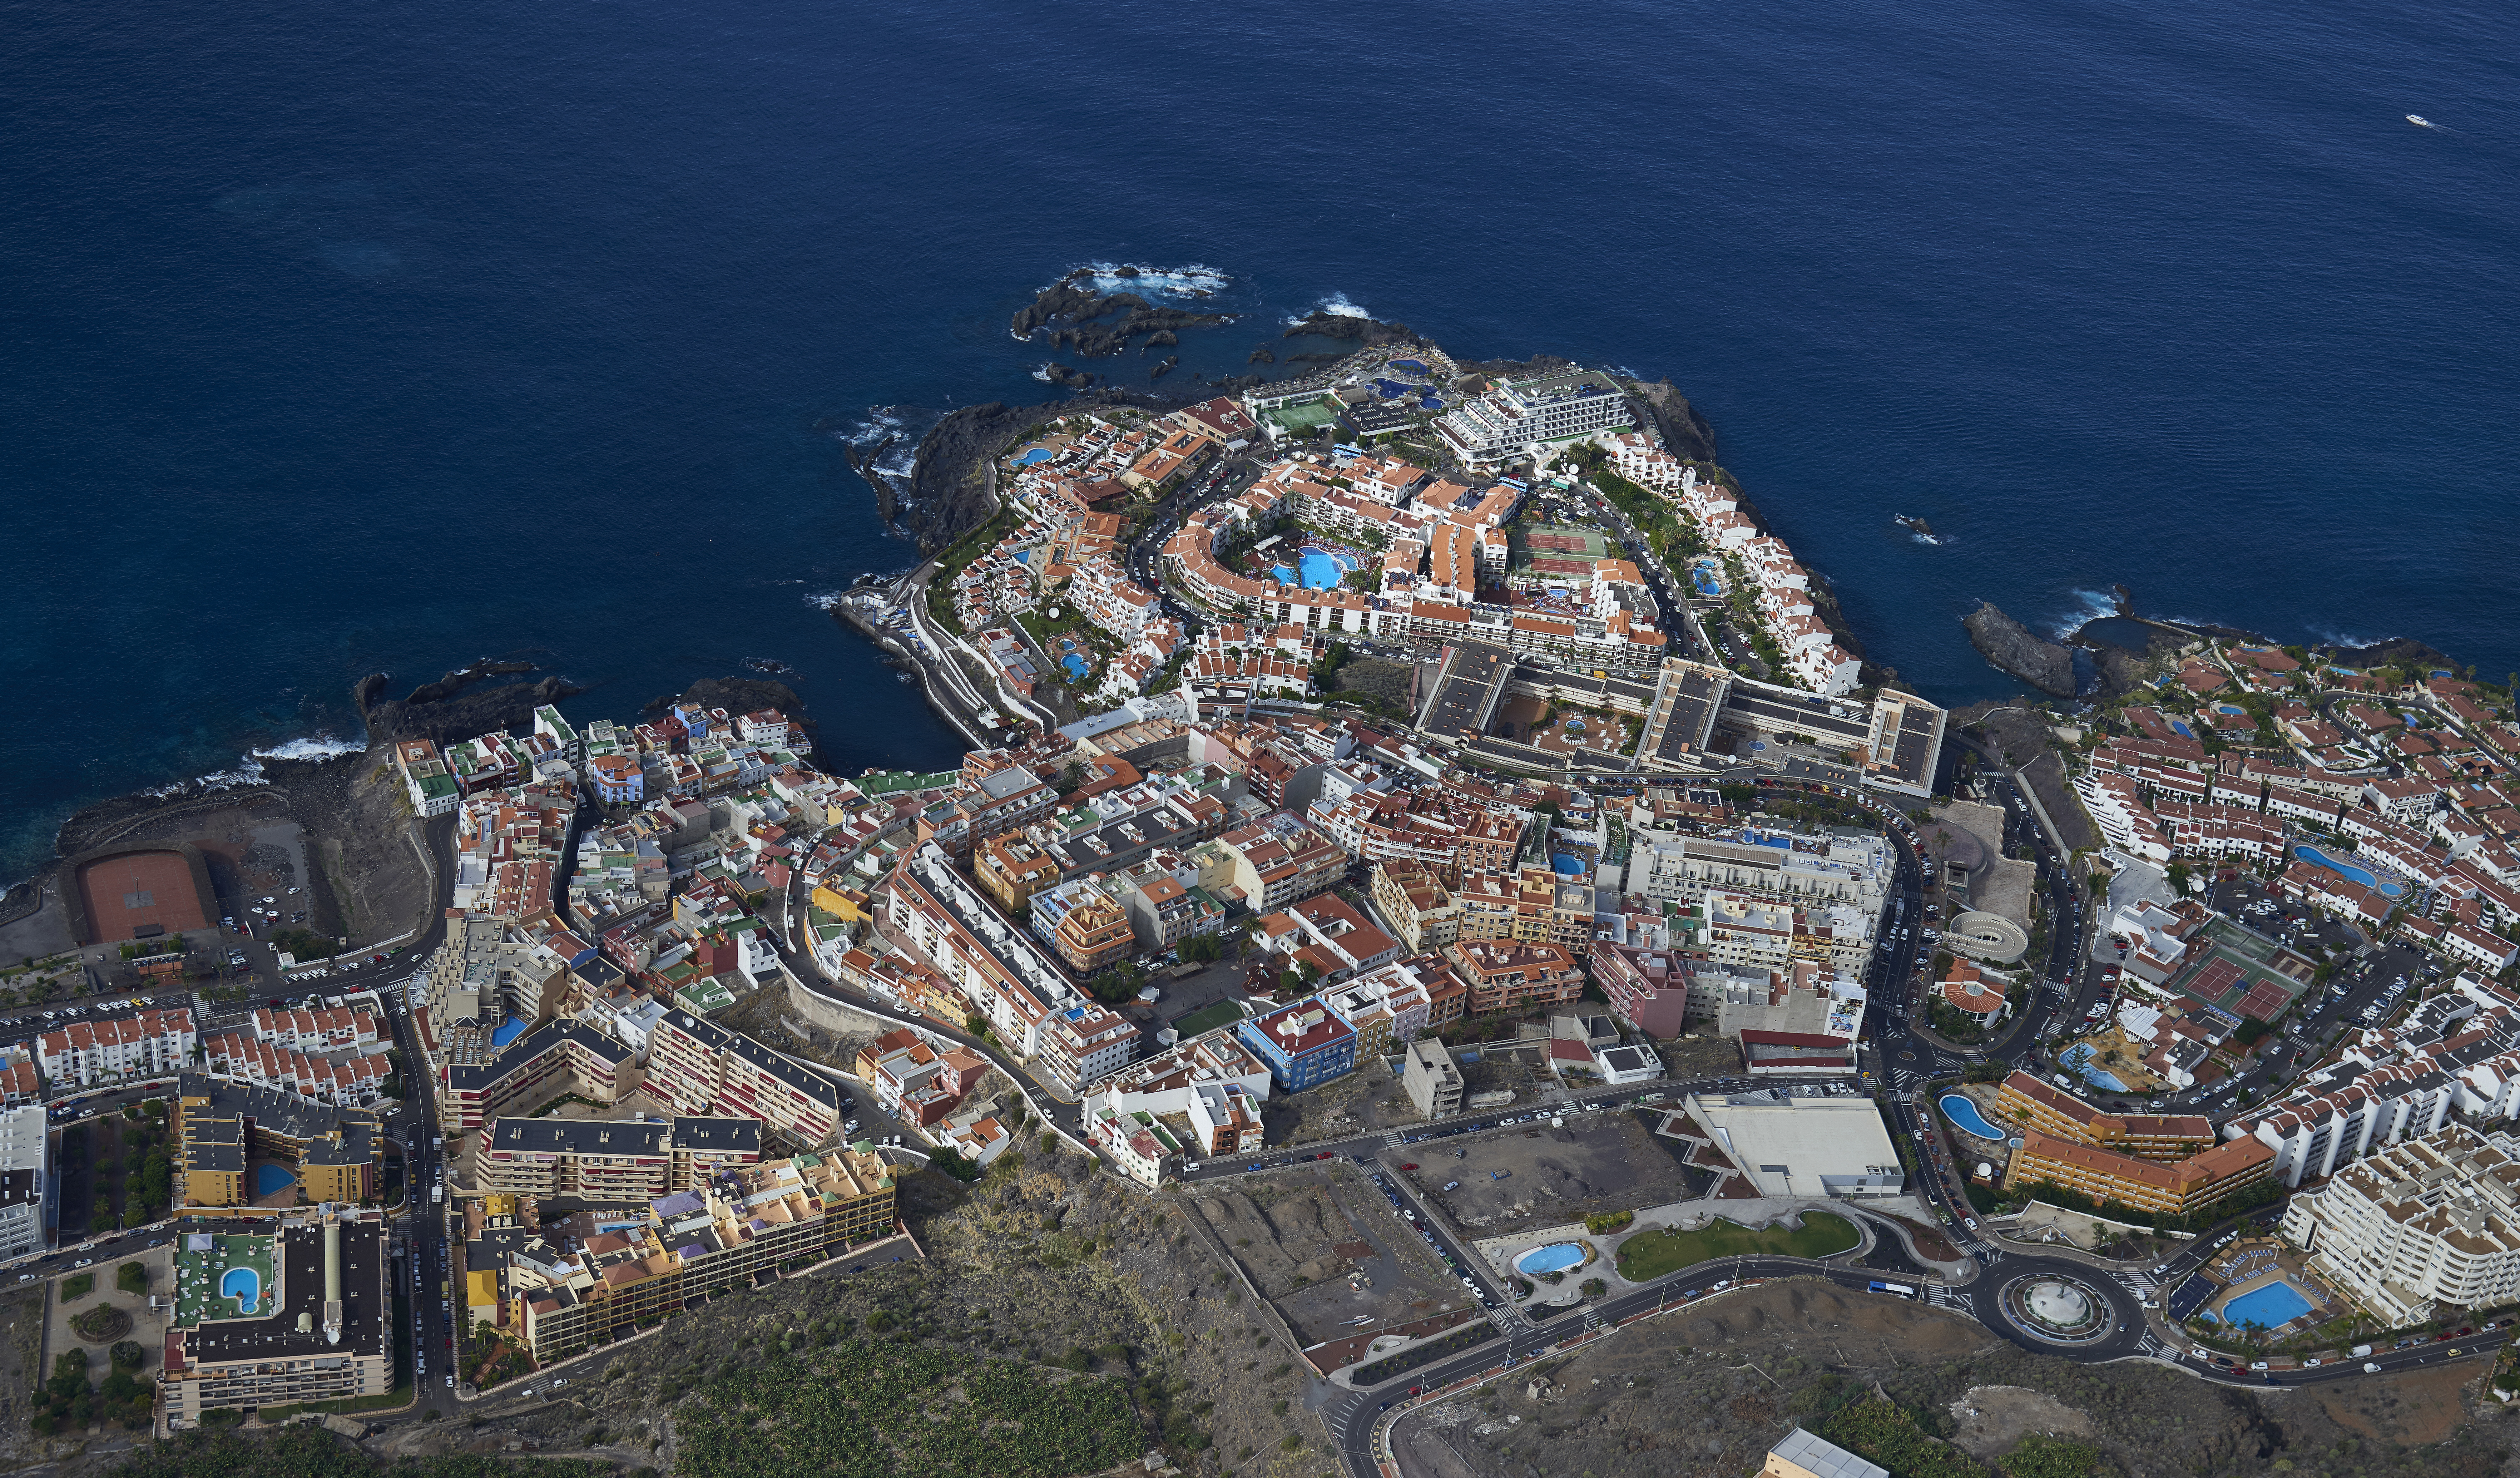 A0224 Tenerife, Los Gigantes aerial.jpg